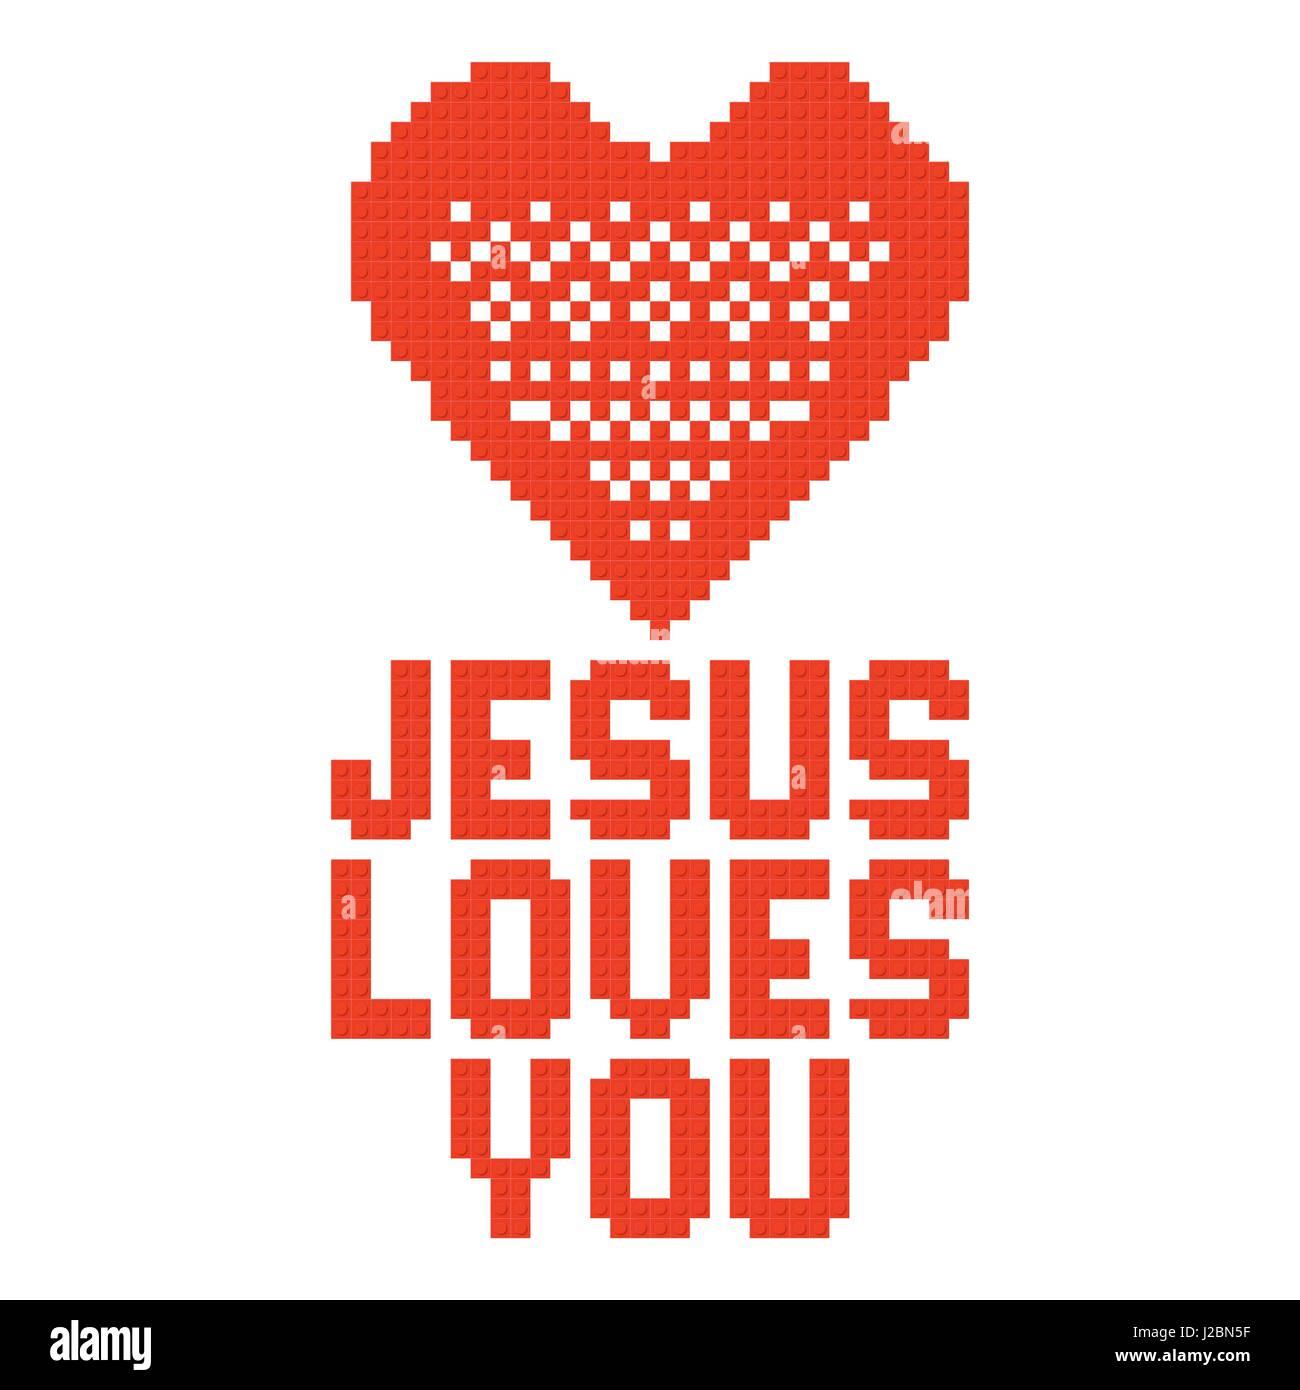 Christian Symbols In Form Lego Stock Photos Christian Symbols In